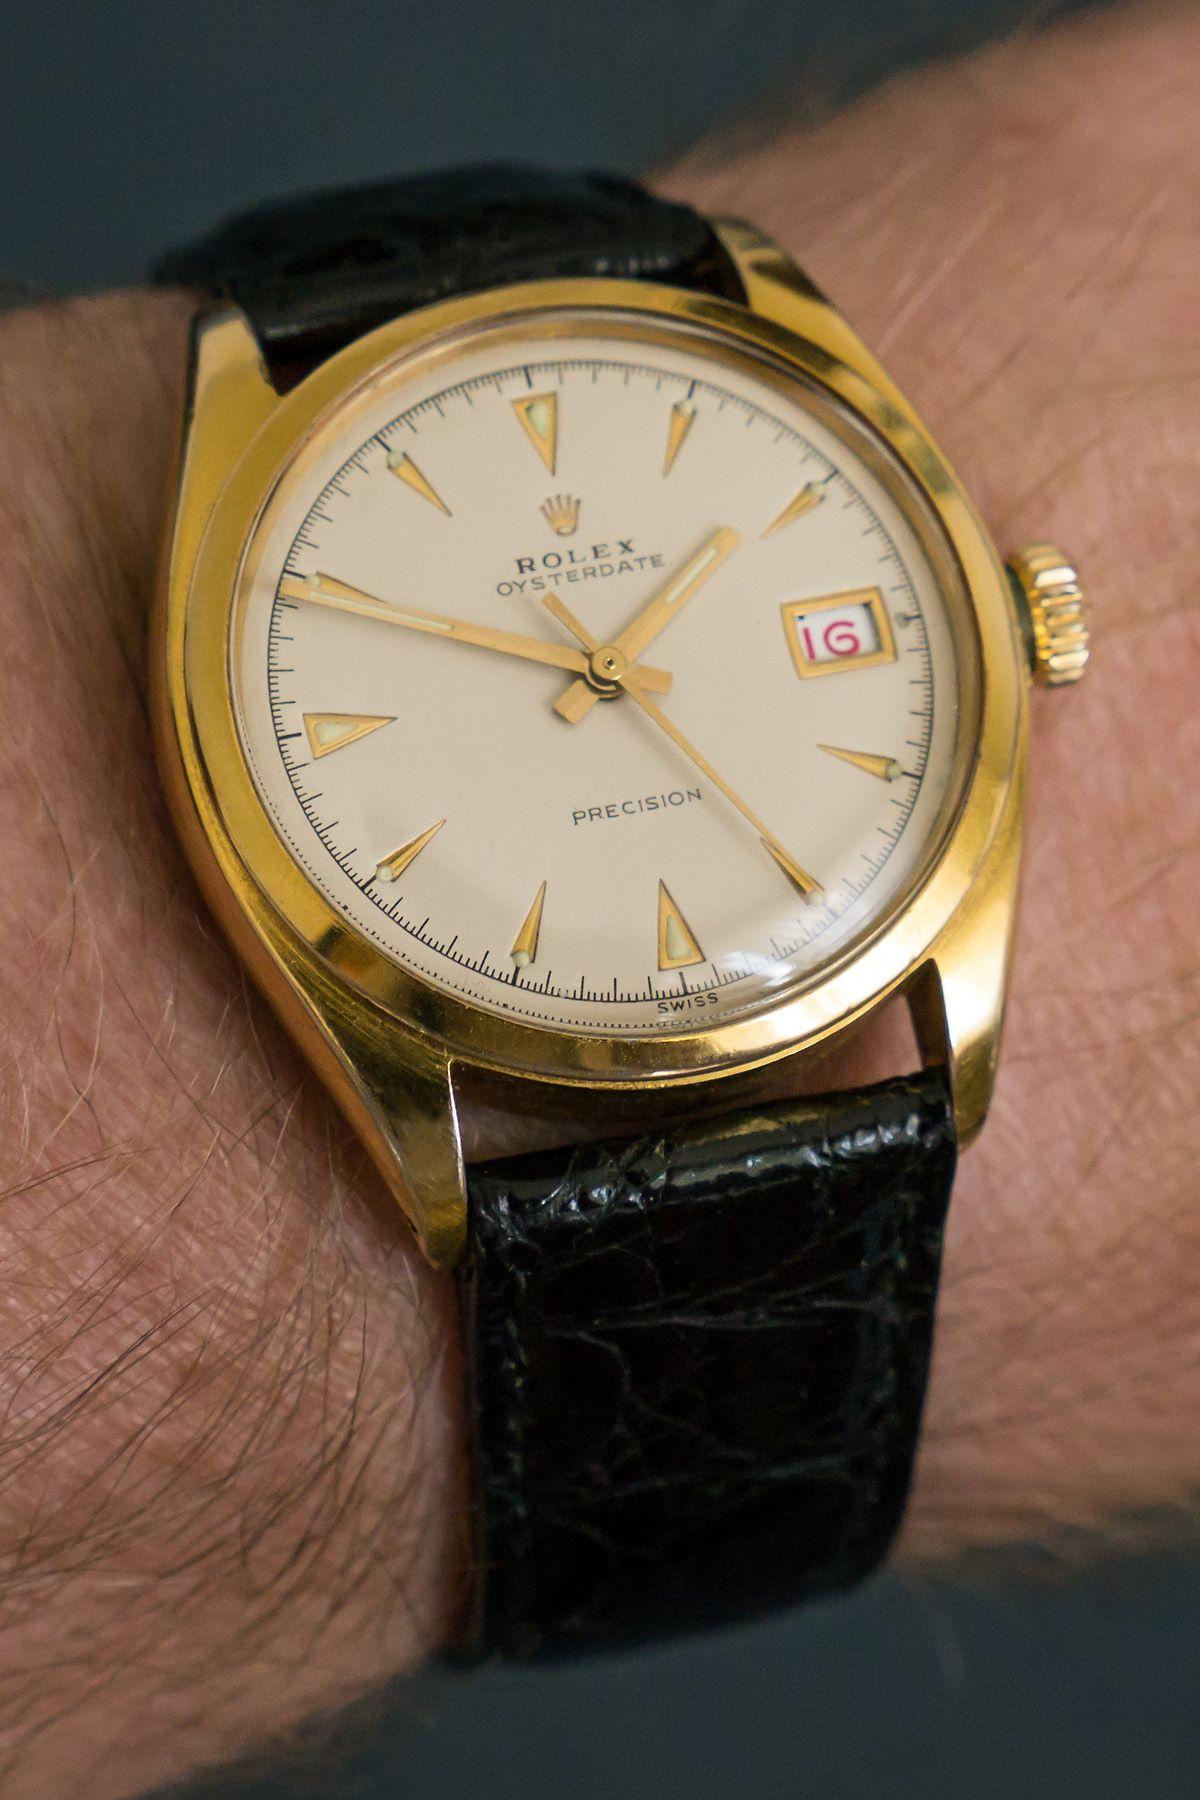 Rolex 1954 wikimedia commons